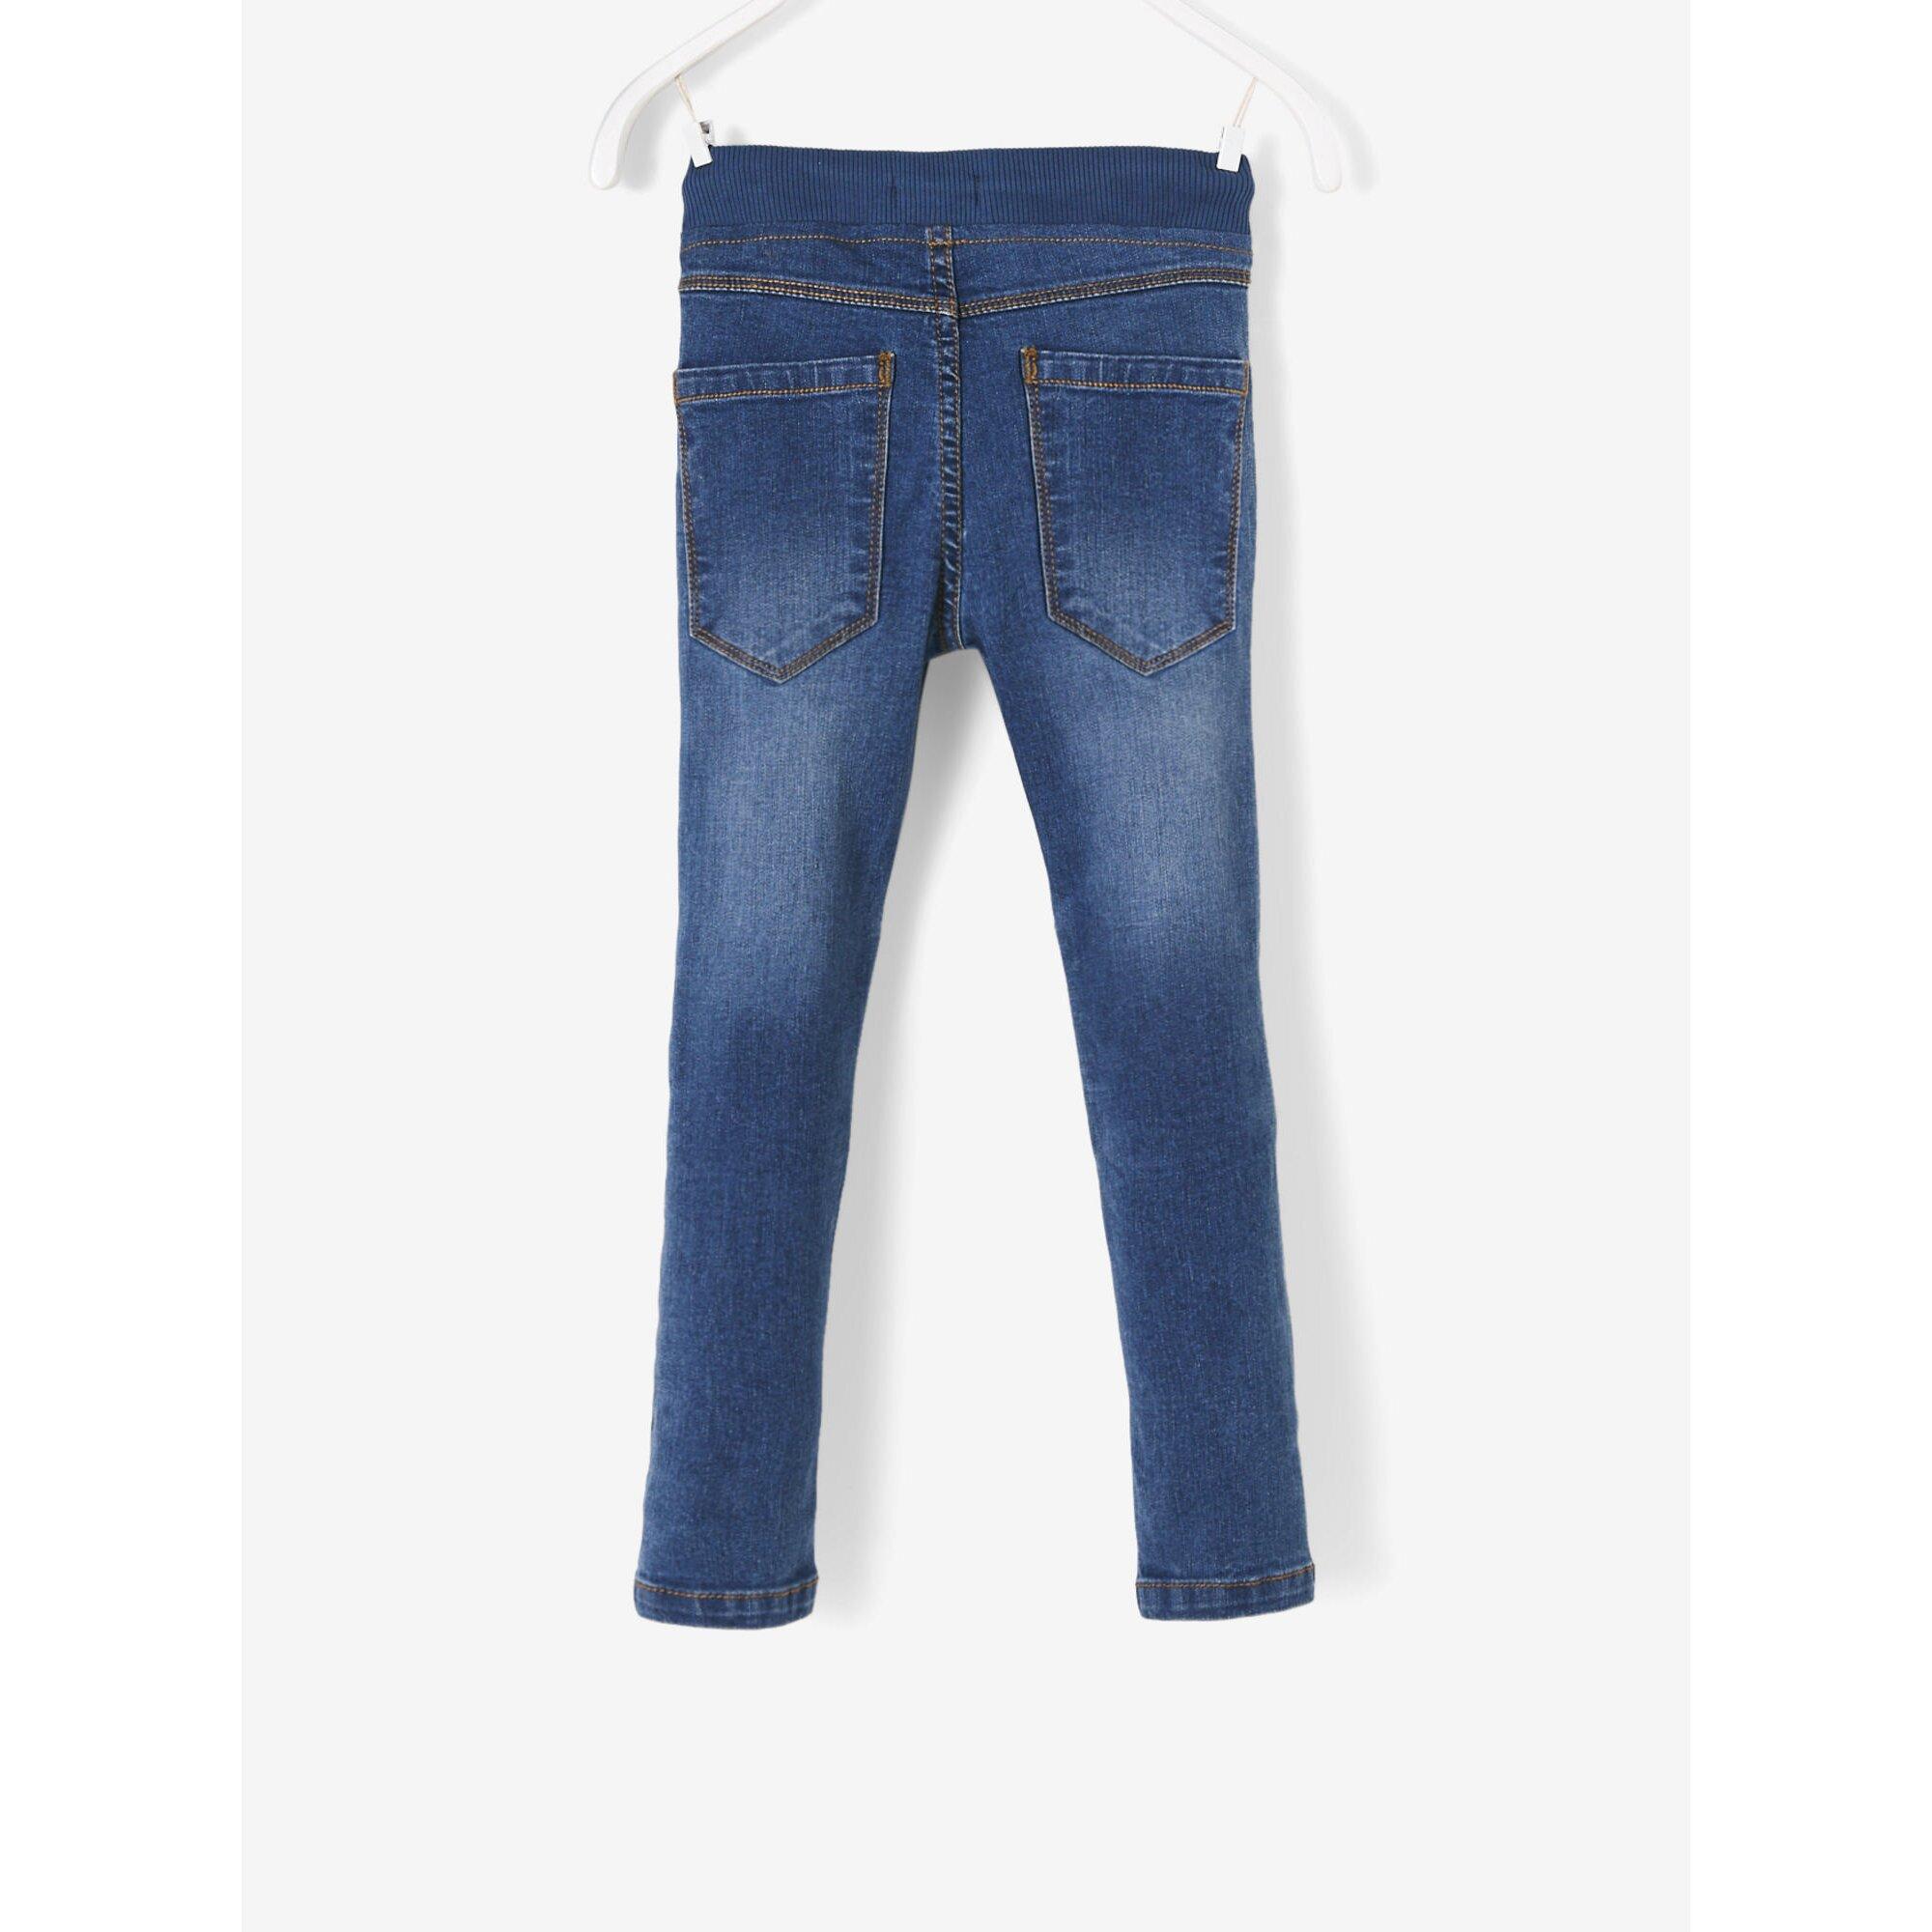 vertbaudet-jungen-slim-fit-jeans-huftweite-regular